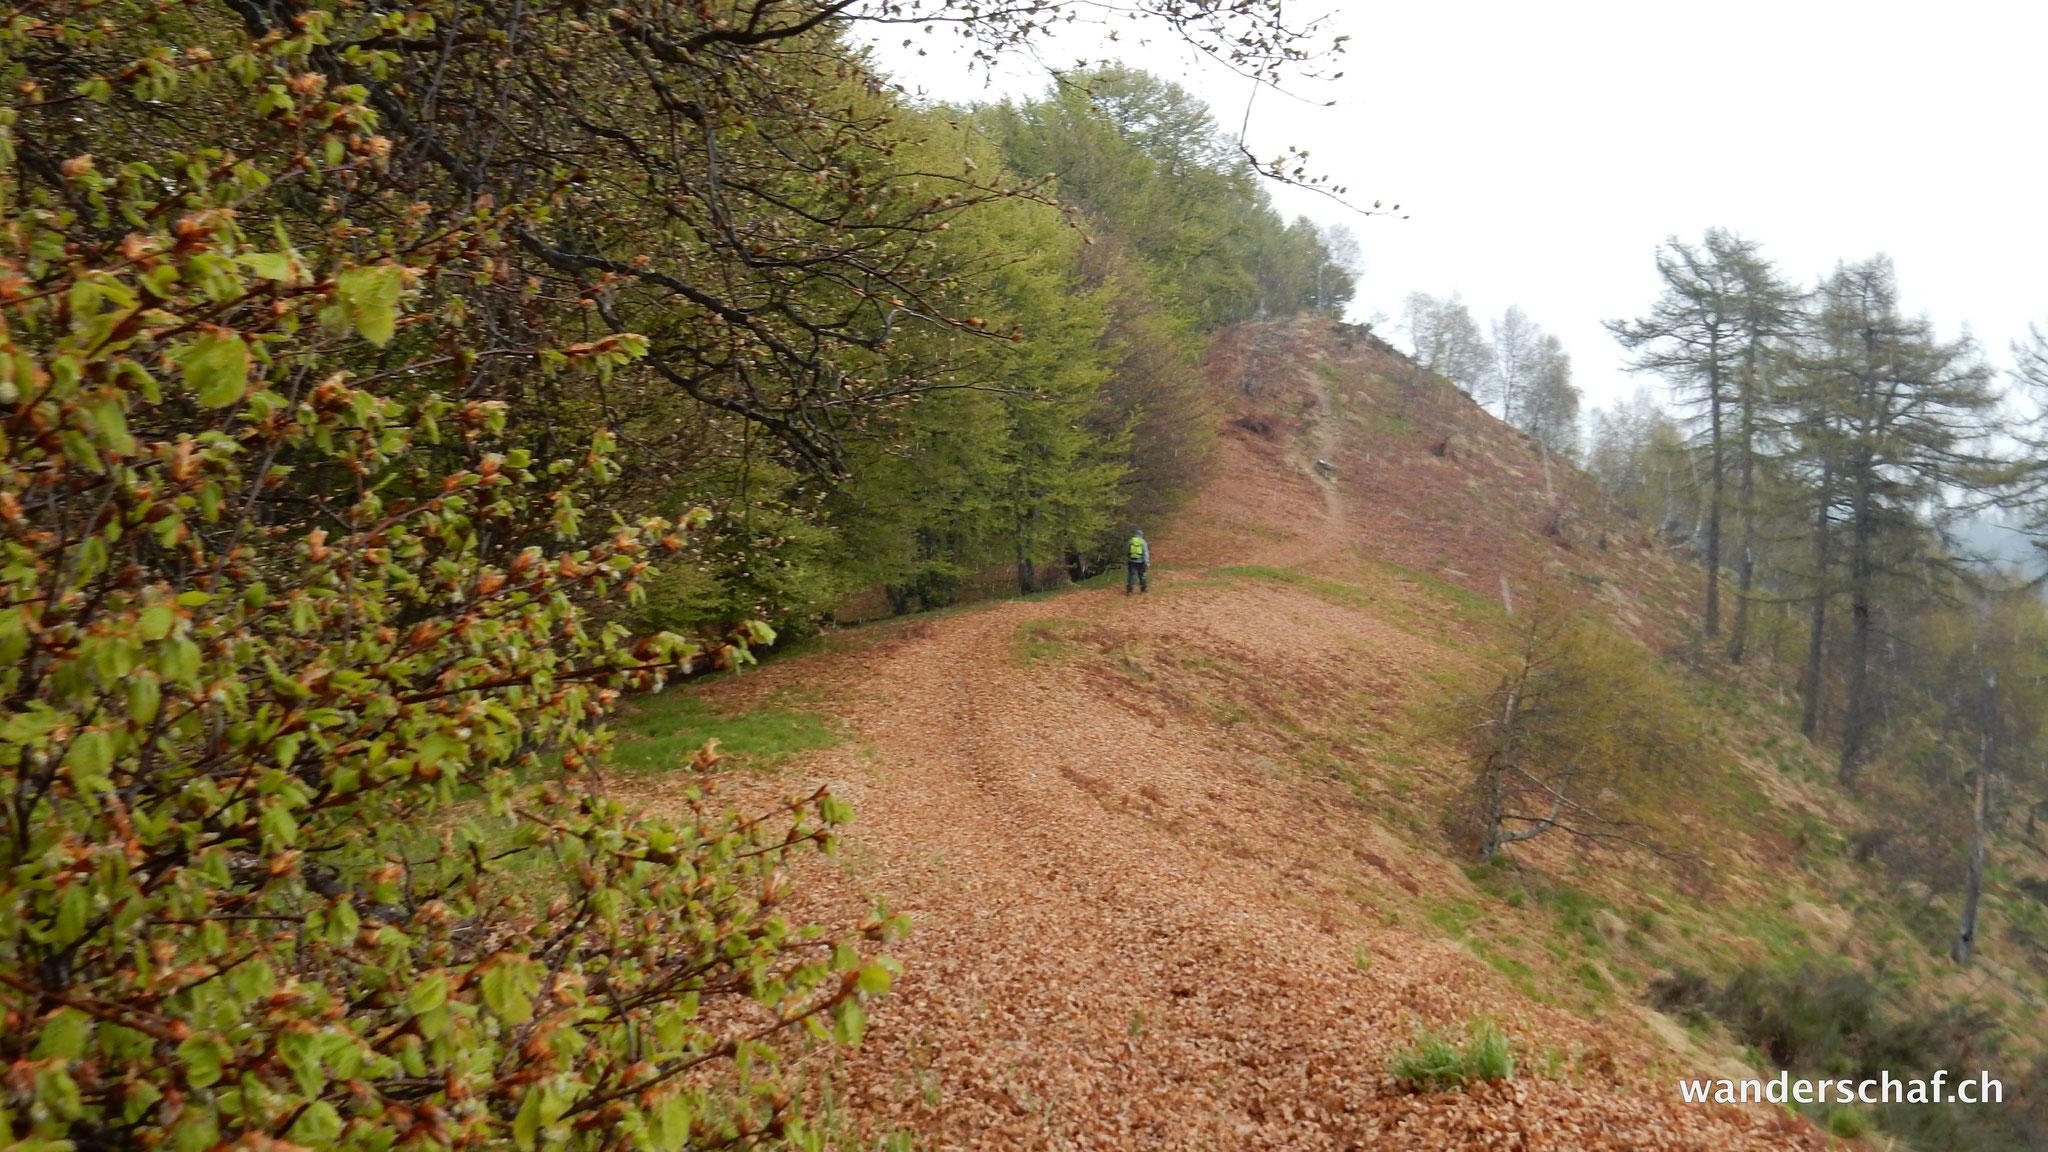 schöner Weiterweg dem Grat entlang Richtung Pizzo Pernice